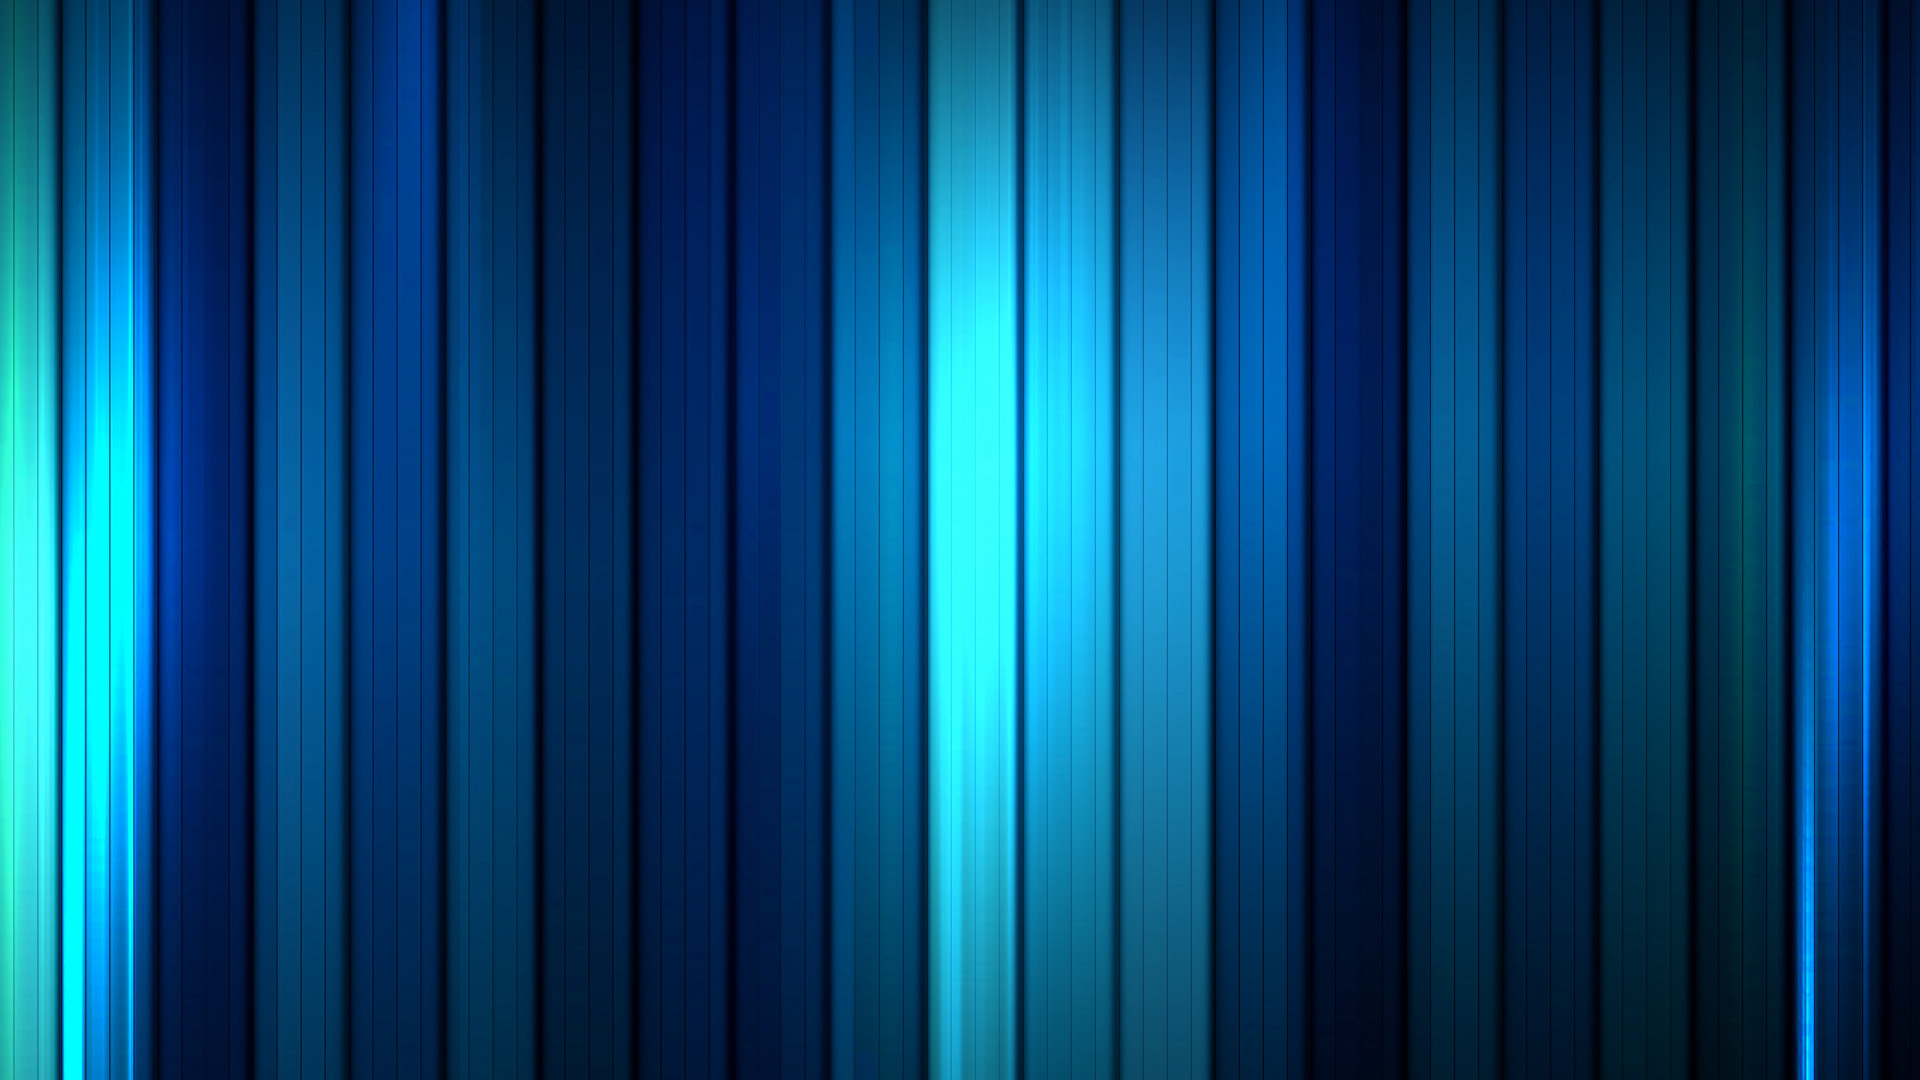 blue hd backgrounds desktop